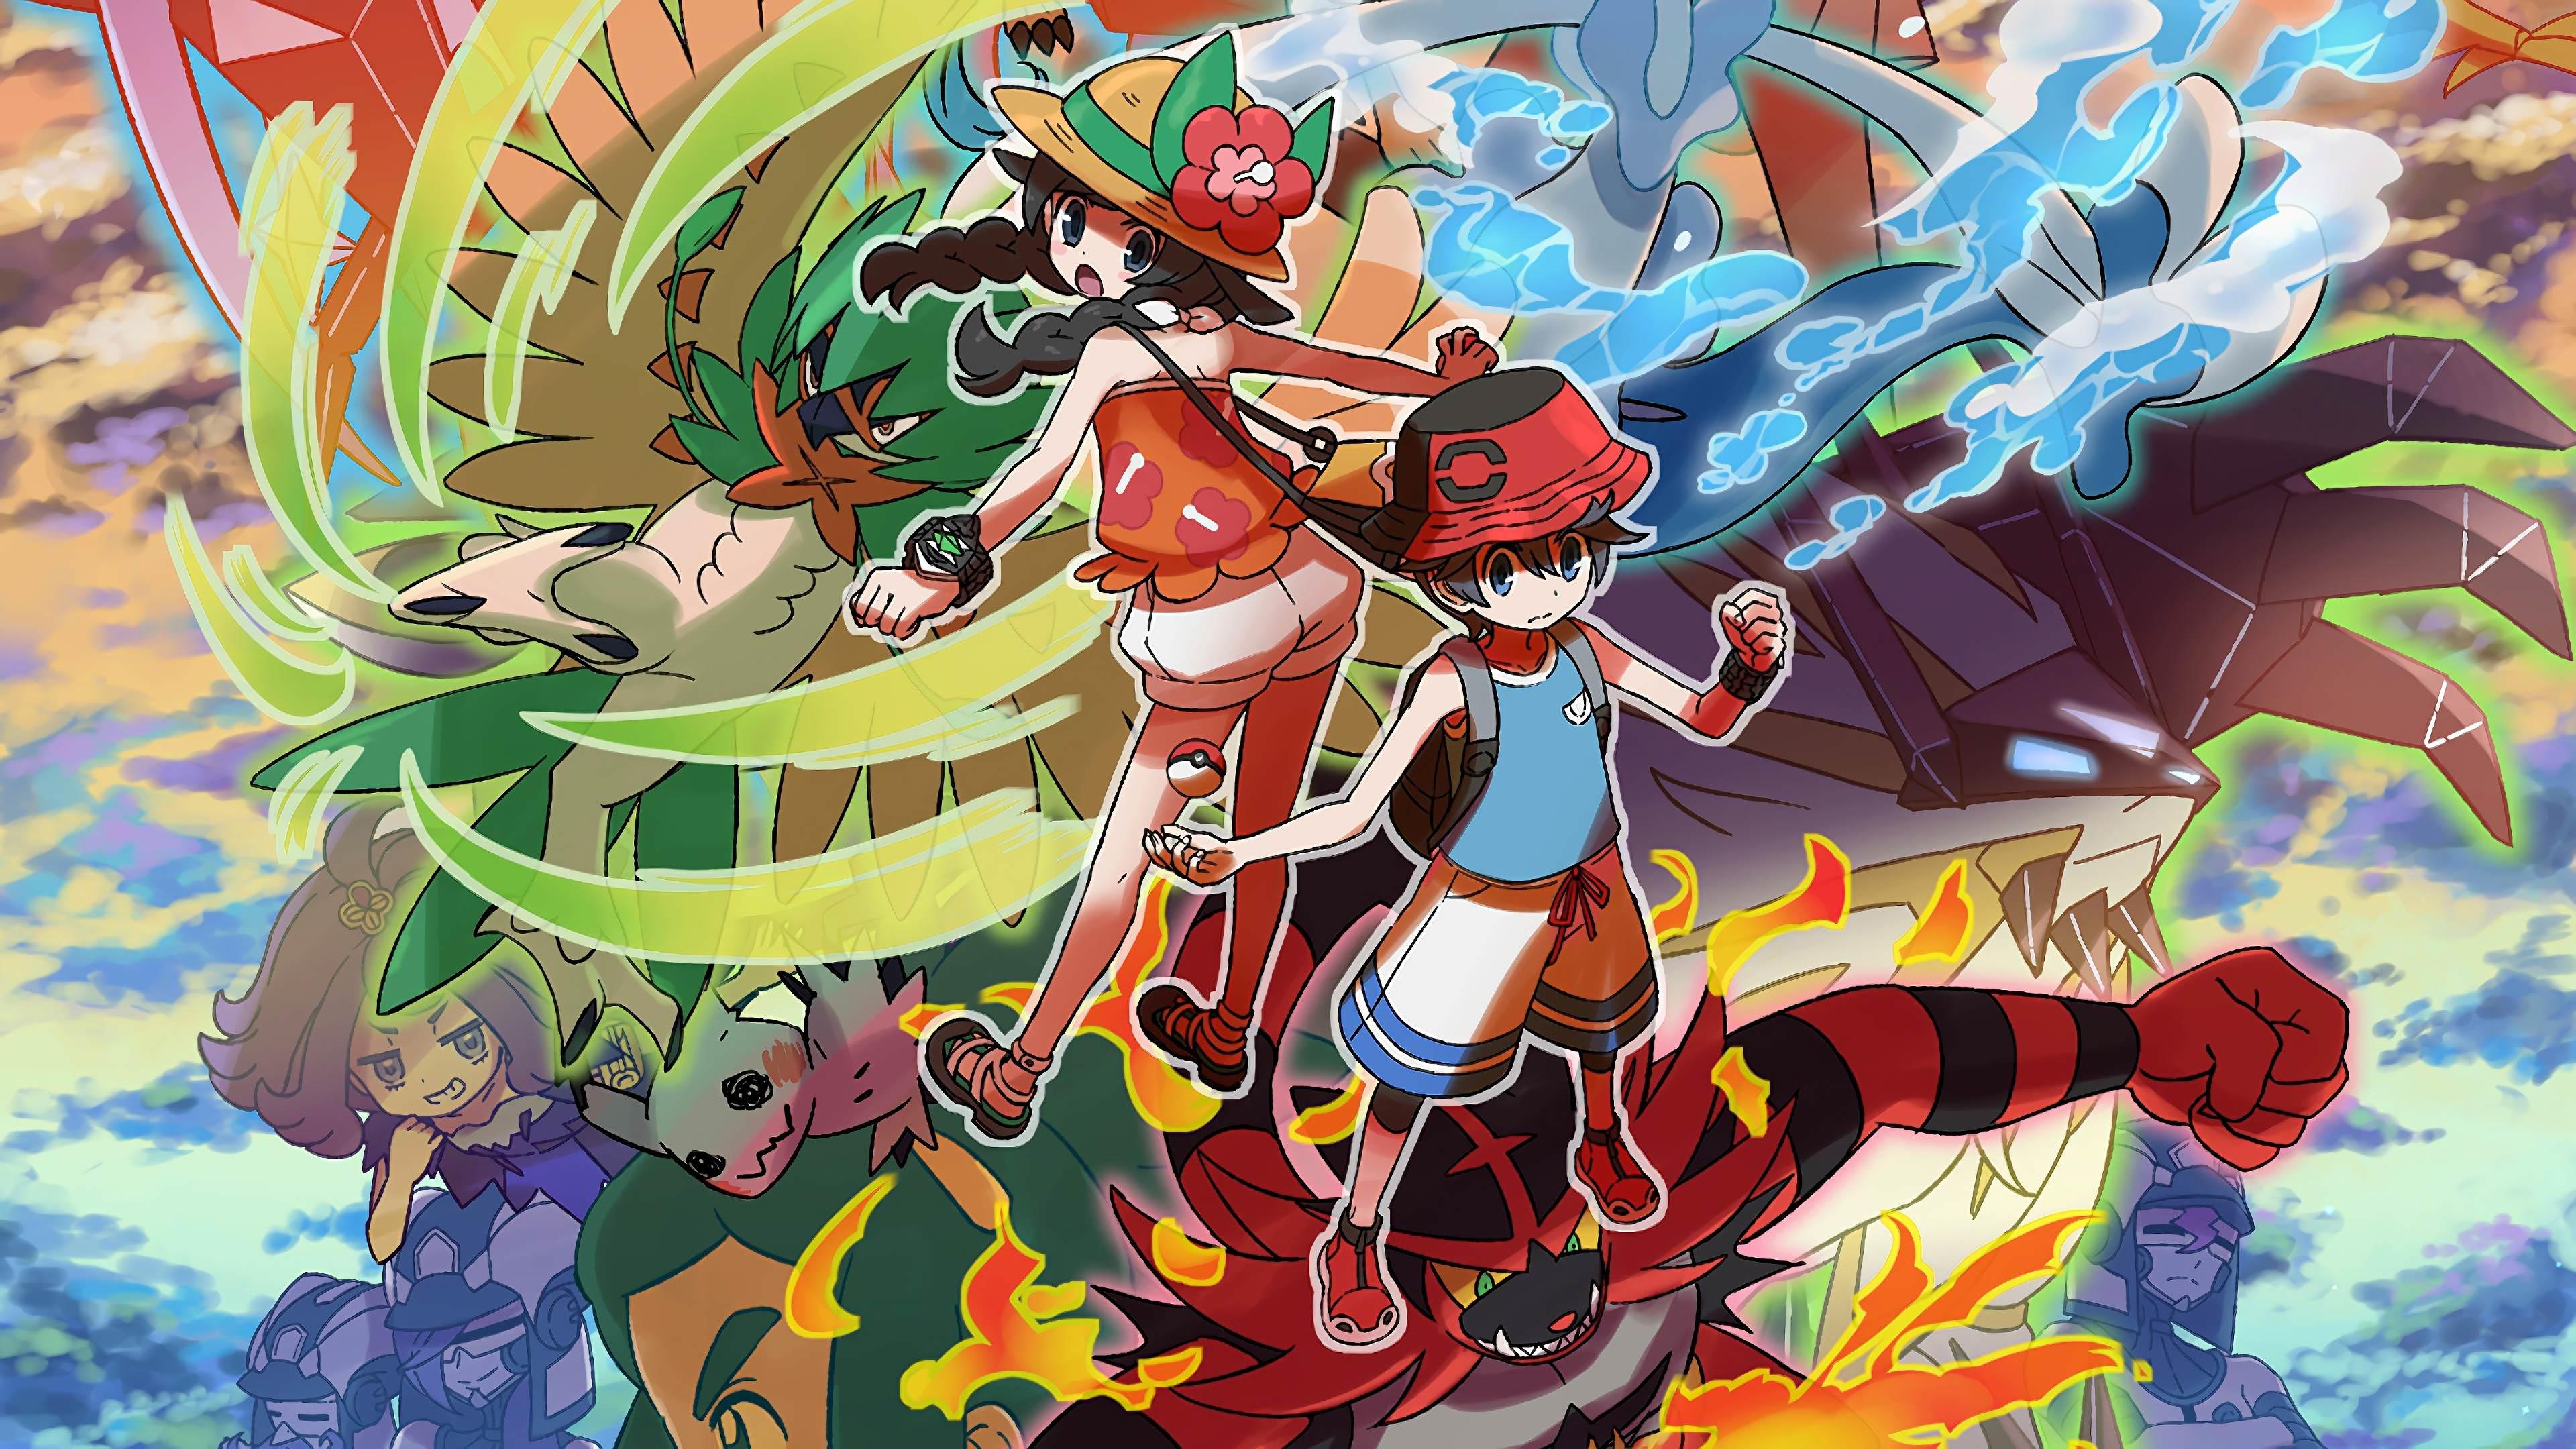 Pokémon Ultra Sun And Ultra Moon Wallpapers - Wallpaper Cave